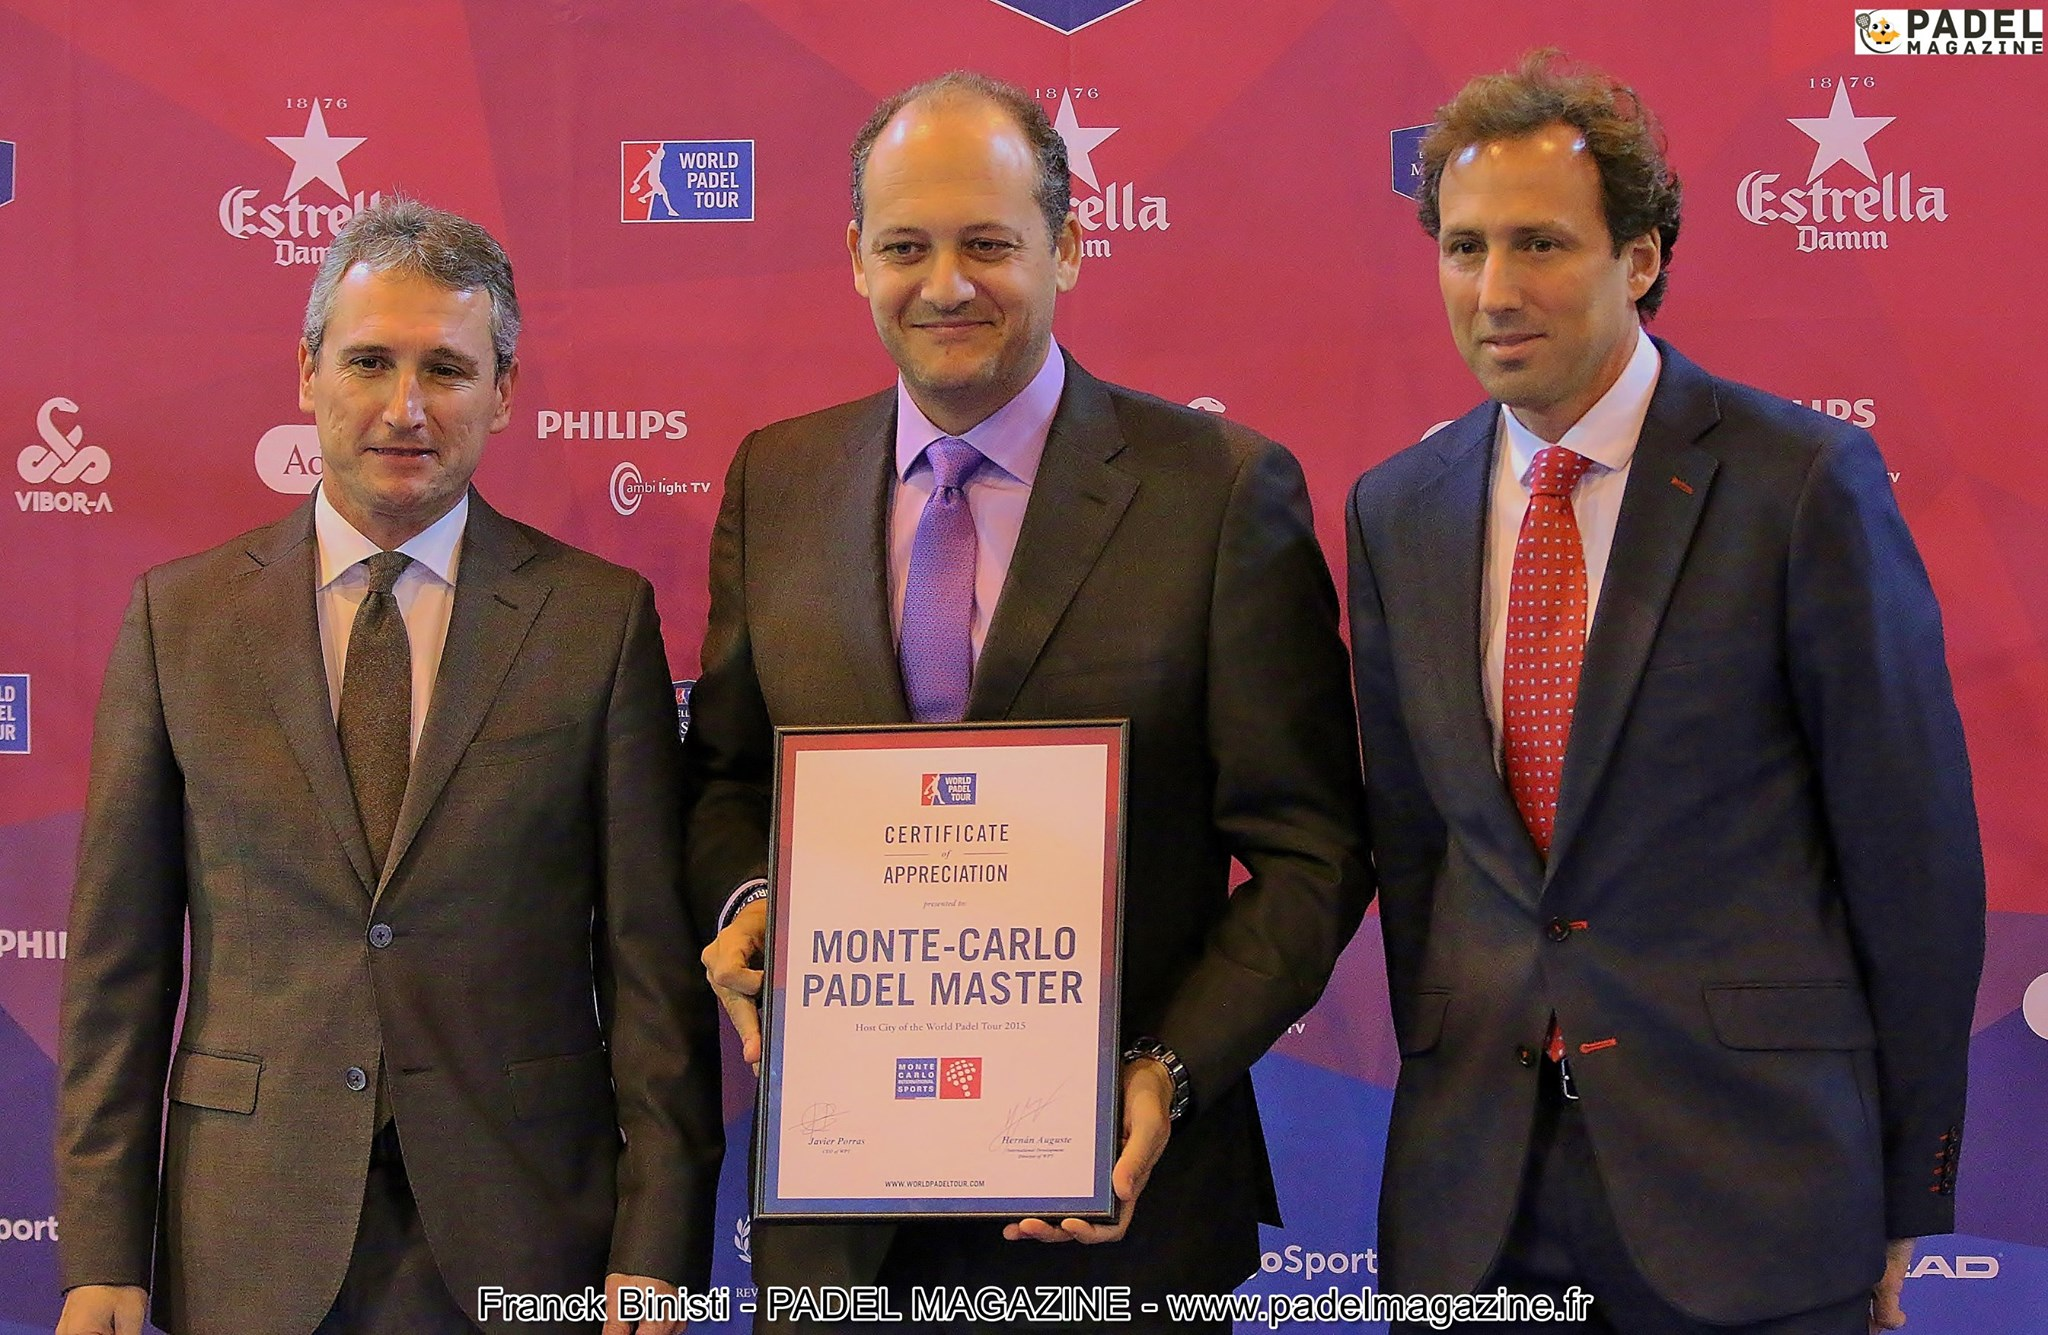 Le Monte Carlo Padel Master confirme son étape féminine